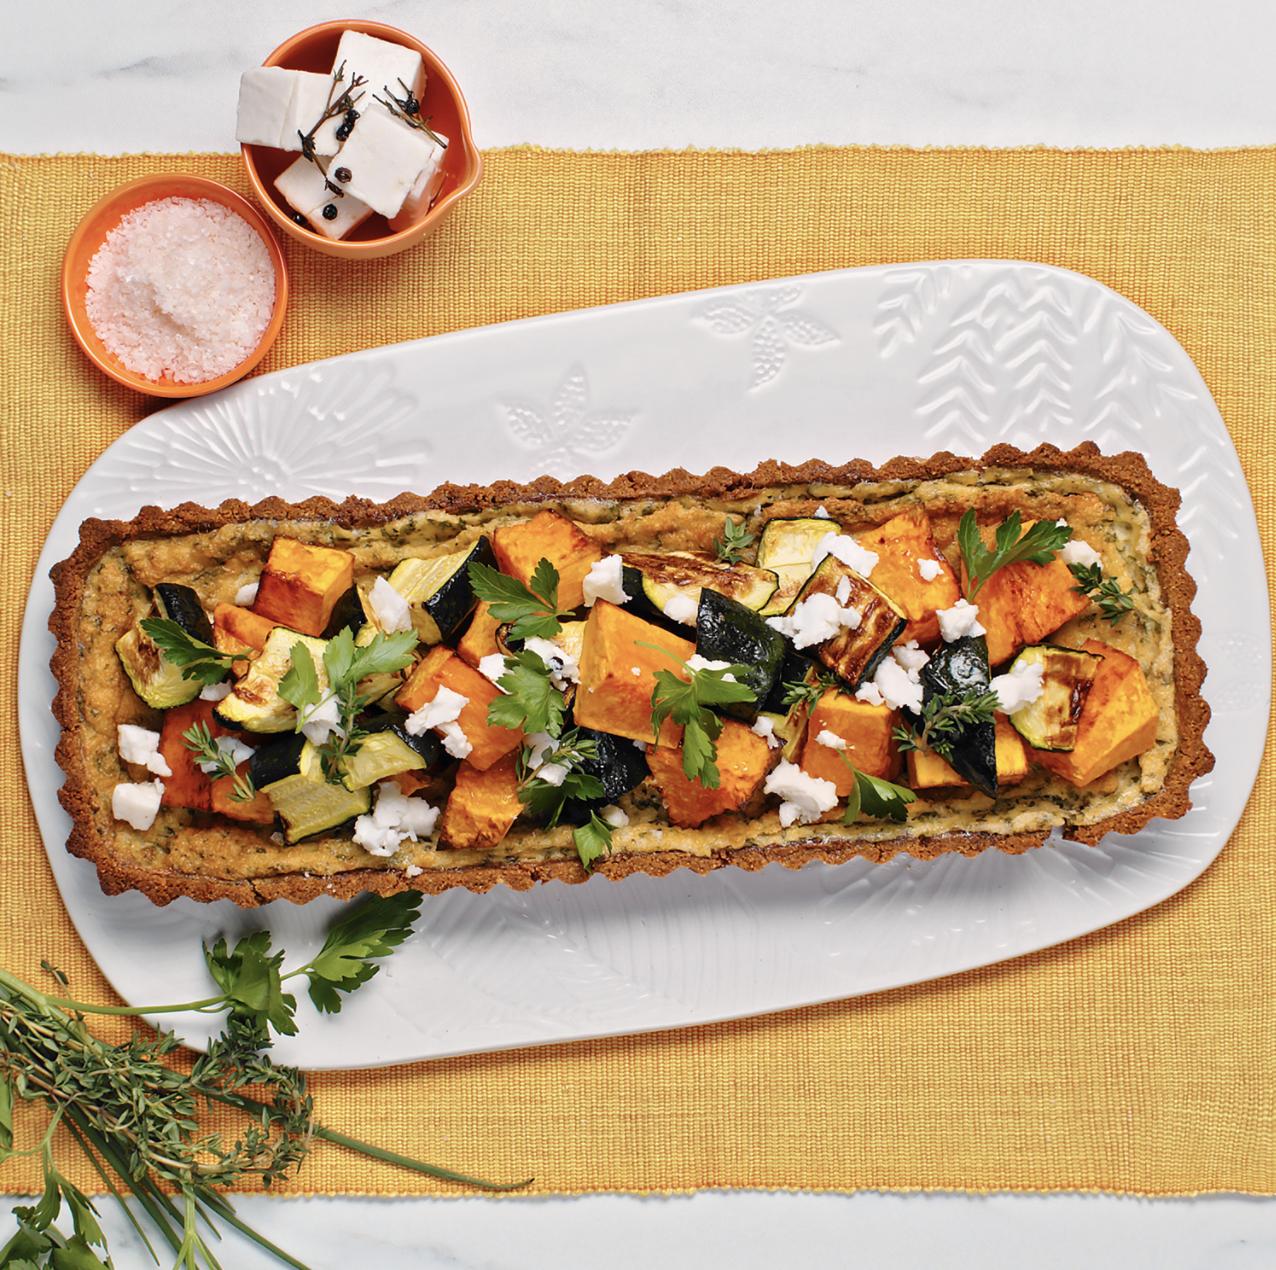 Roasted Pumpkin and Zucchini Tart